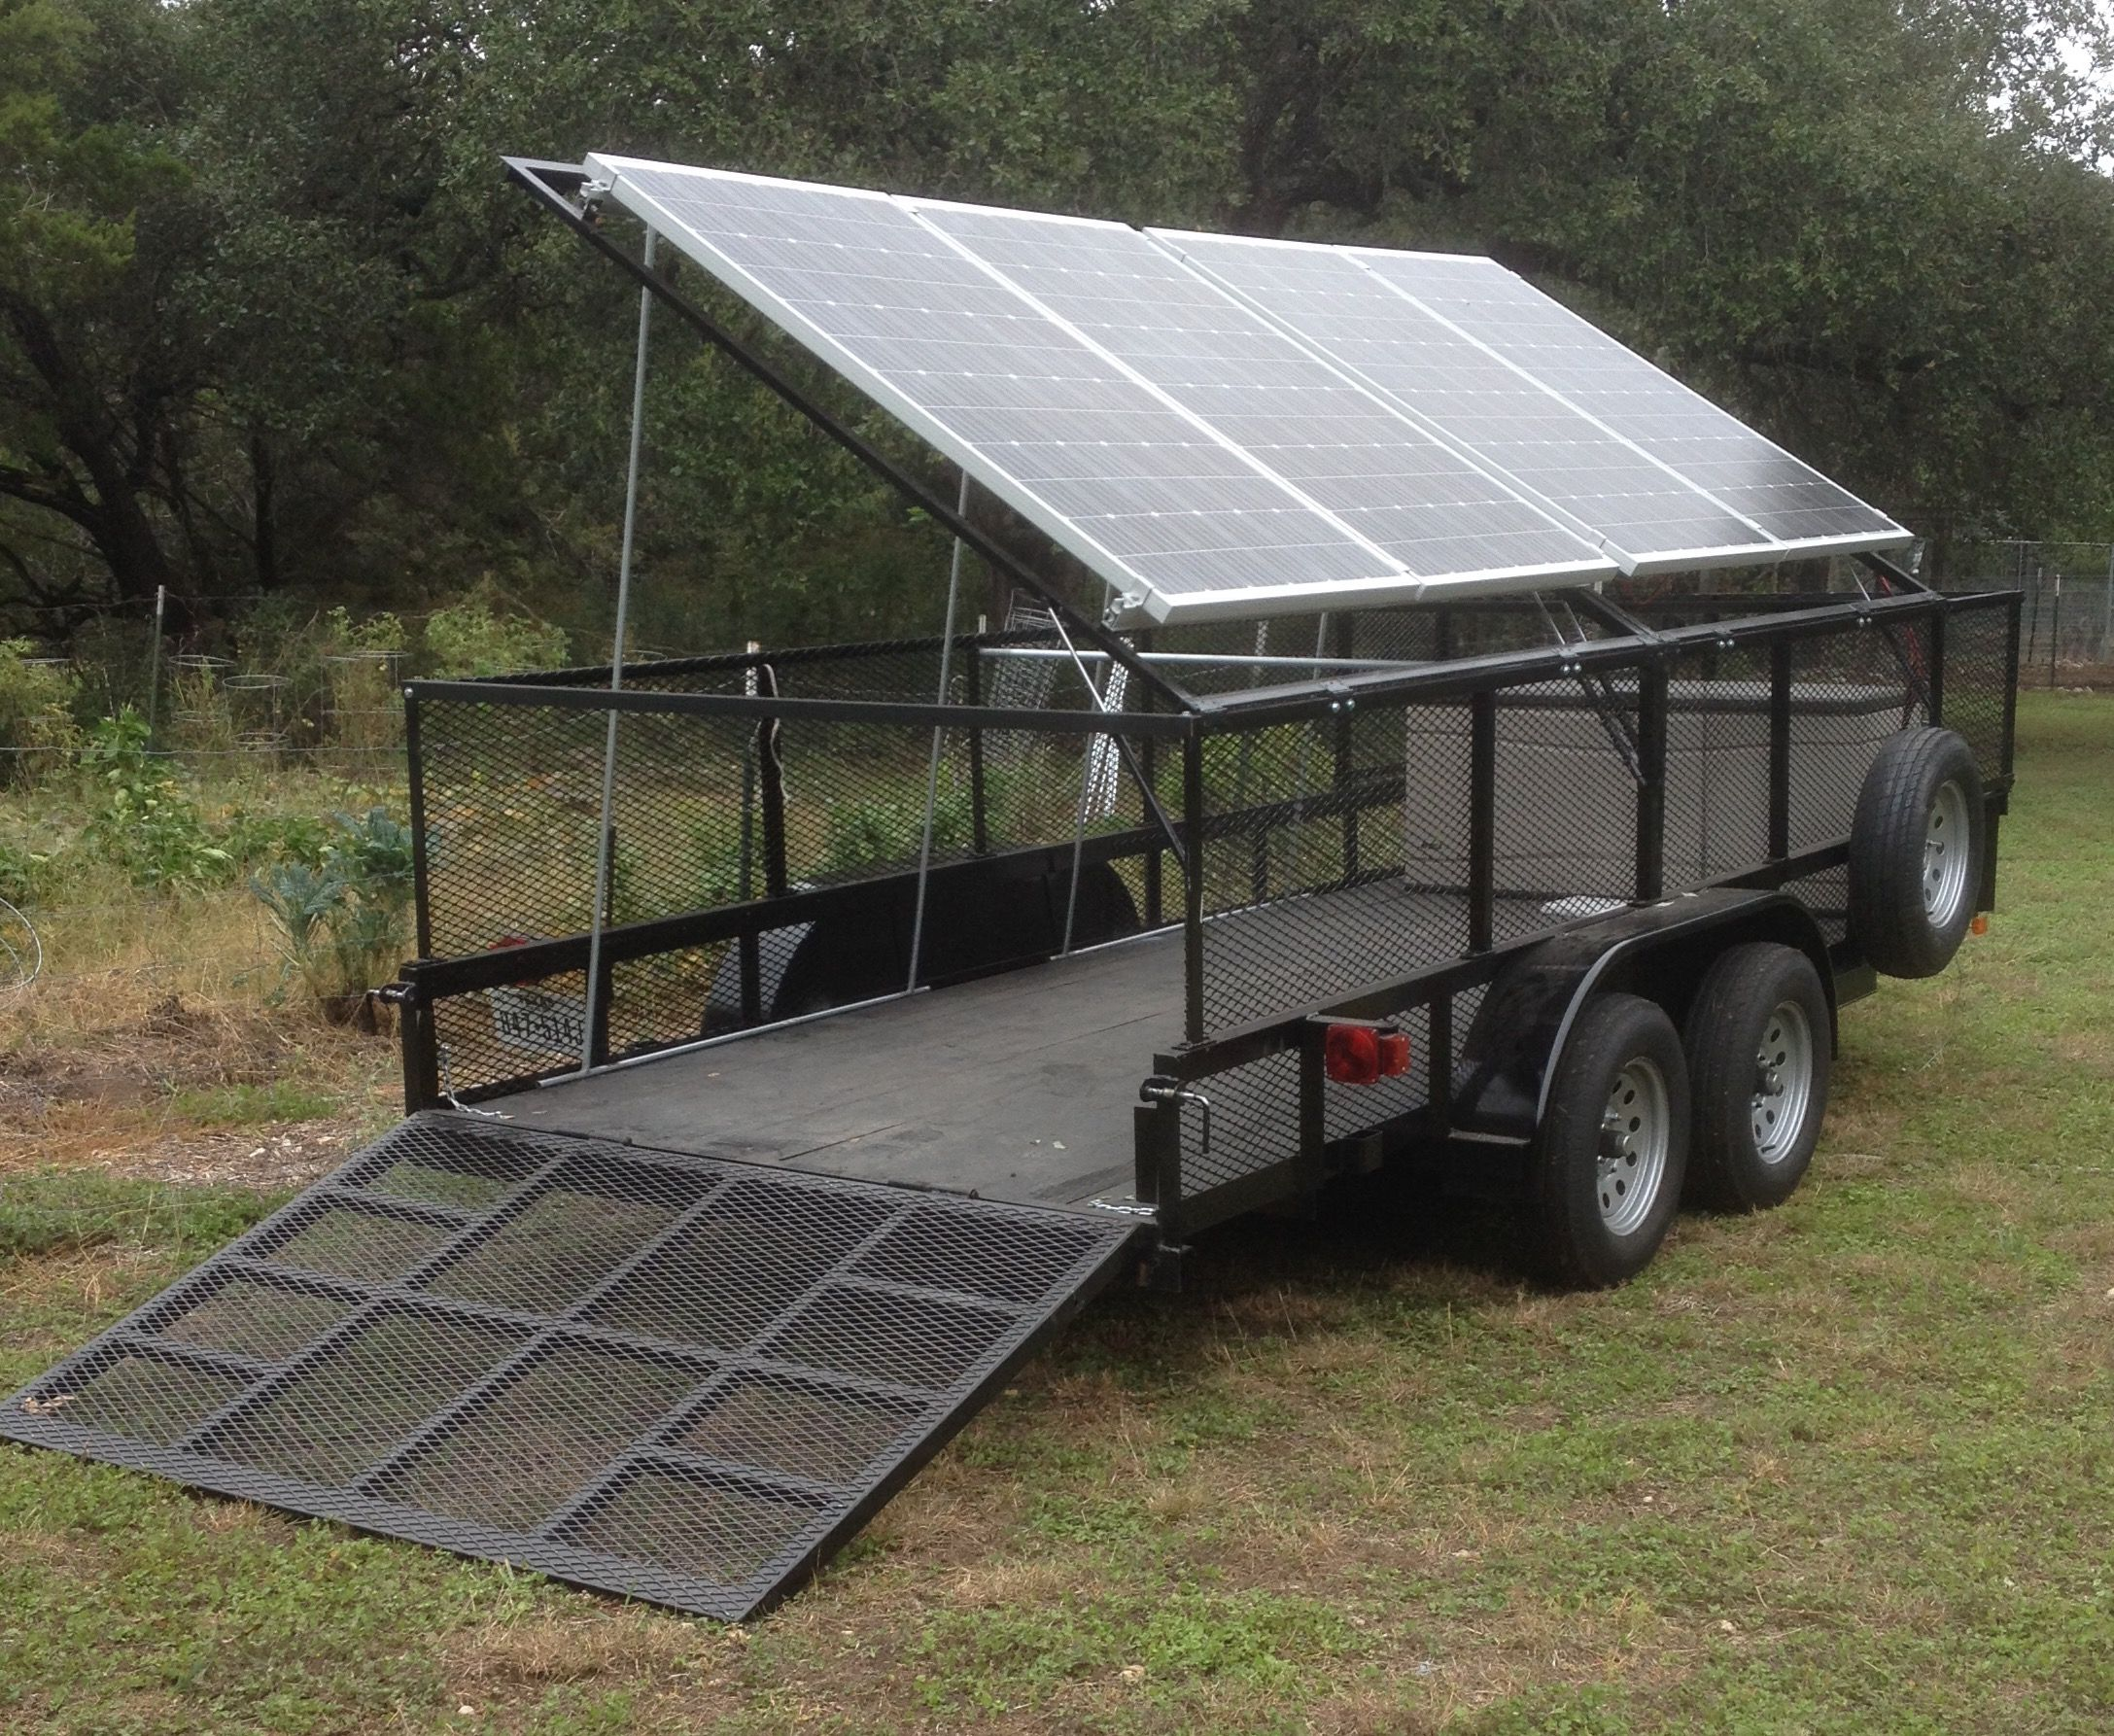 Pin By Wayne Brown On Solar Power Solar Hot Water Off Grid Solar Solar